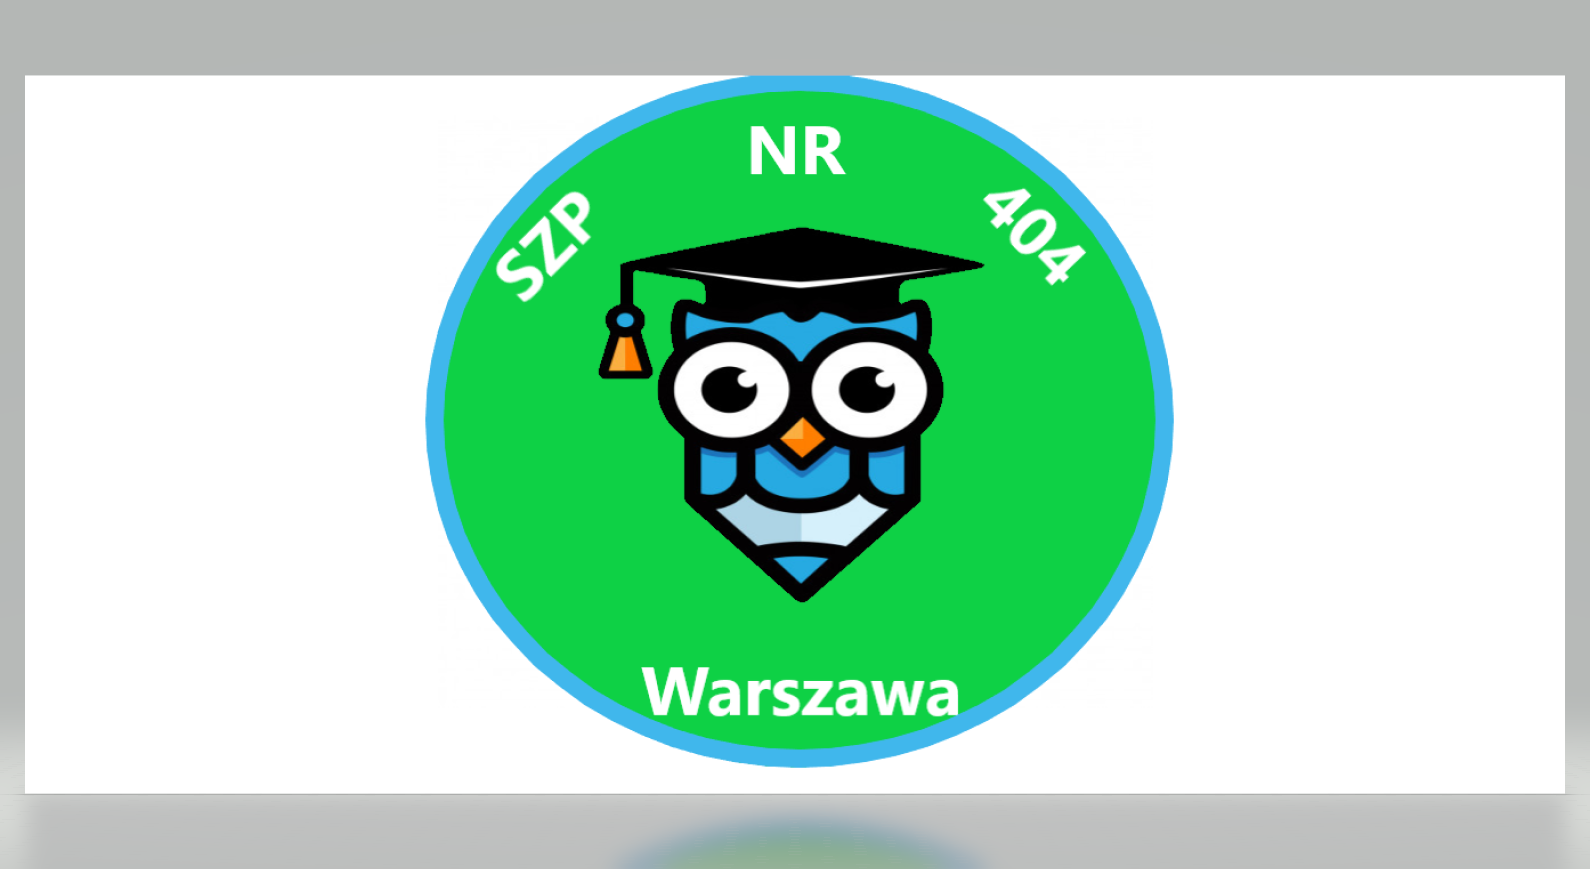 LOGO Tomasz Biedrzycki kl. 4A.png